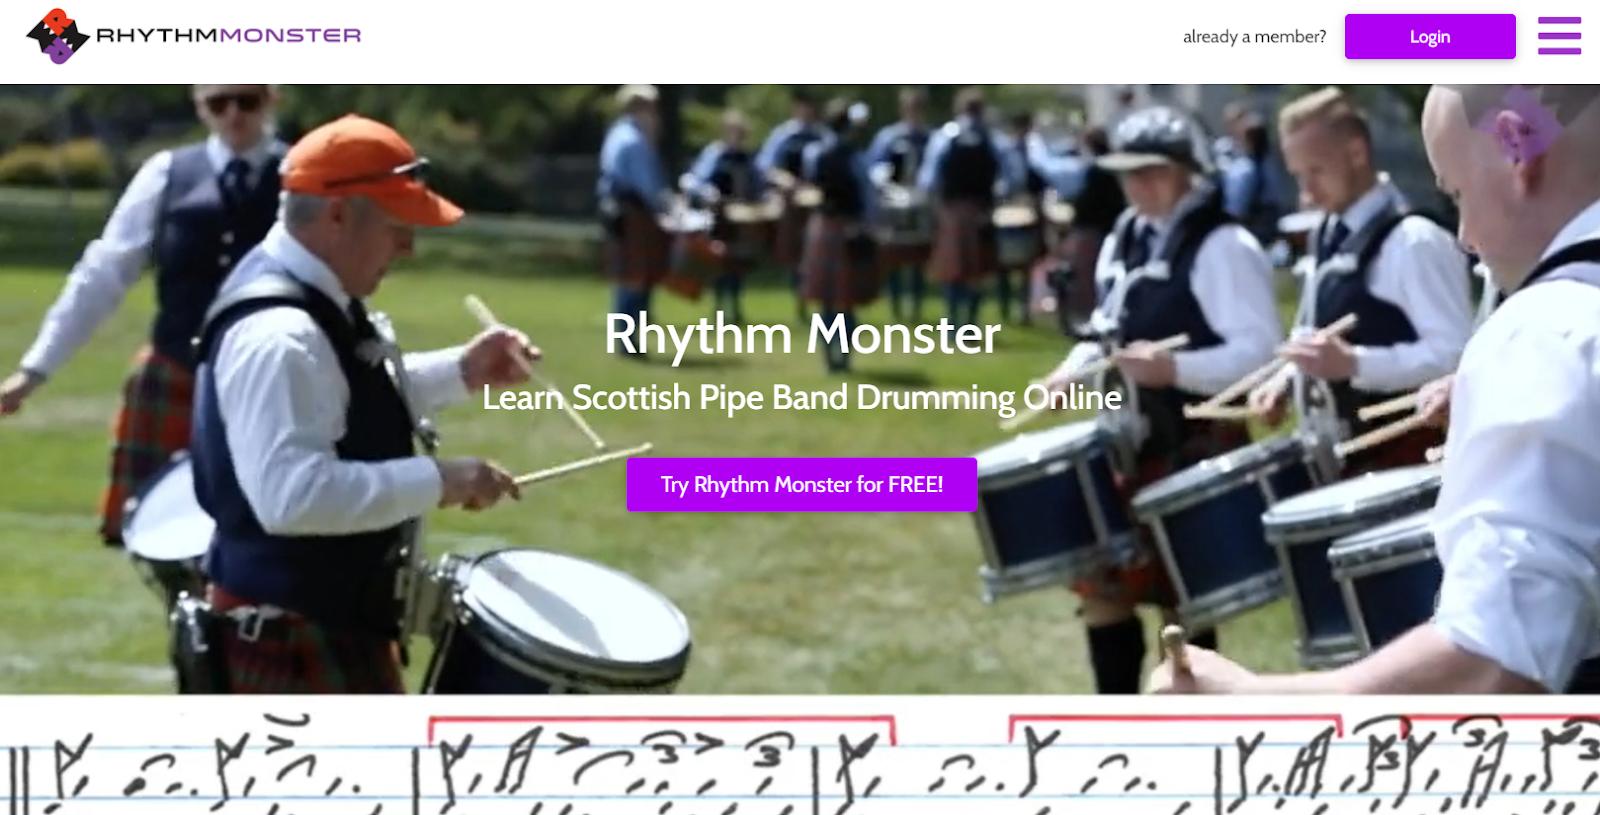 Screenshot of the Rhythm Monster drumming website